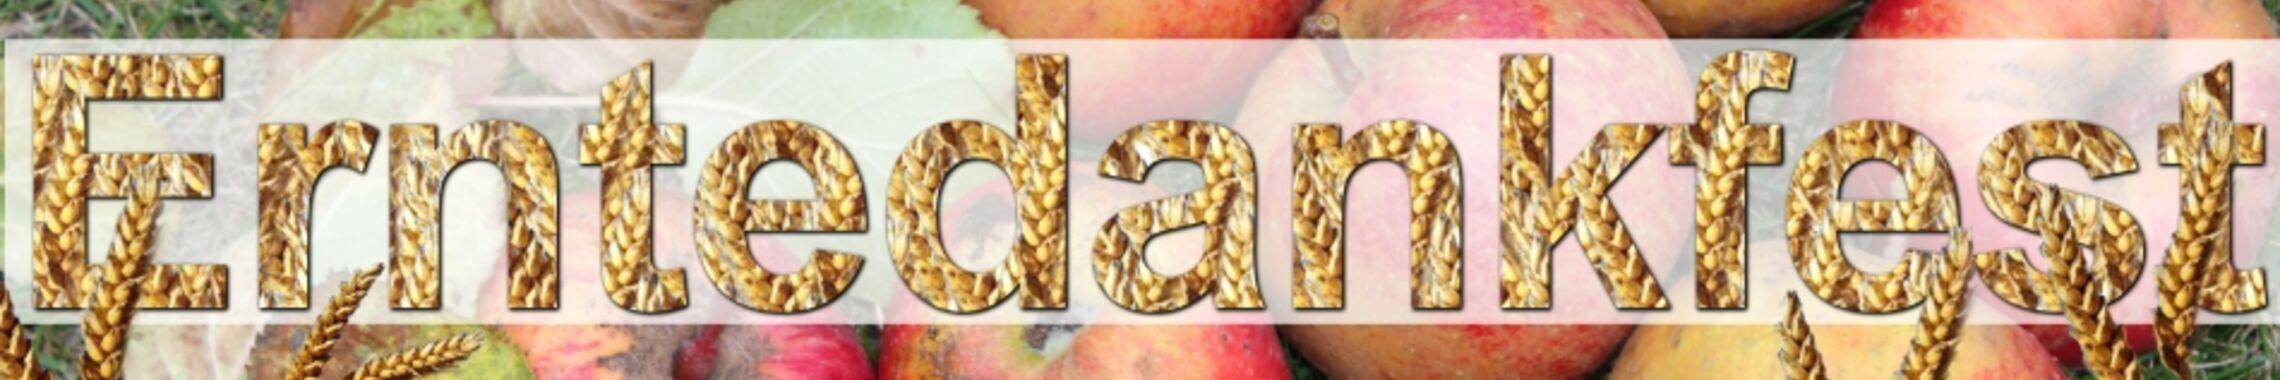 Kopfgrafik Äpfel1wbo